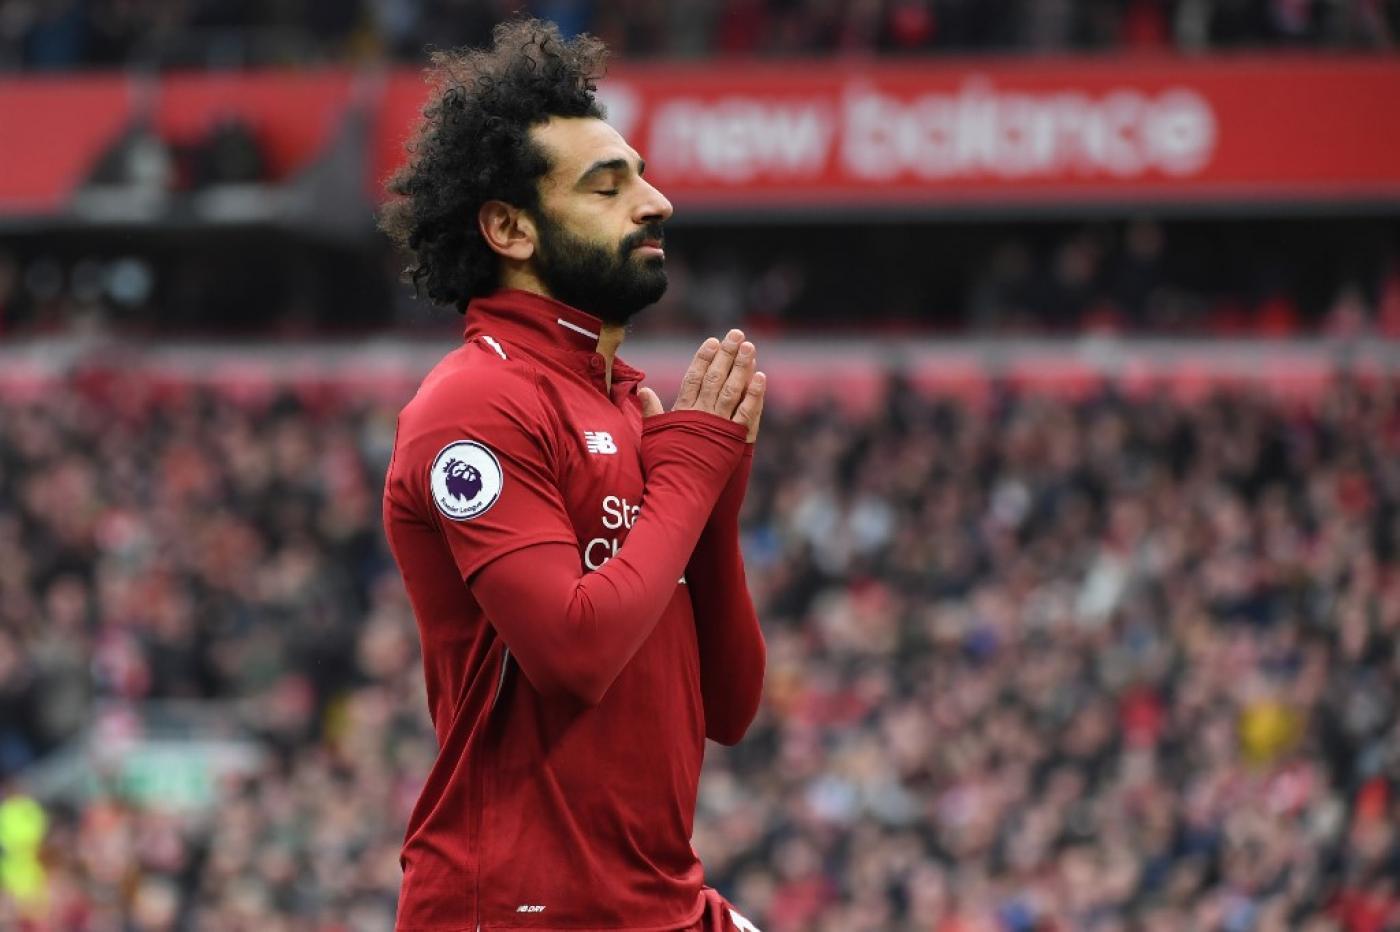 Mohamed Salah keeps his balance while Islamophobia persists